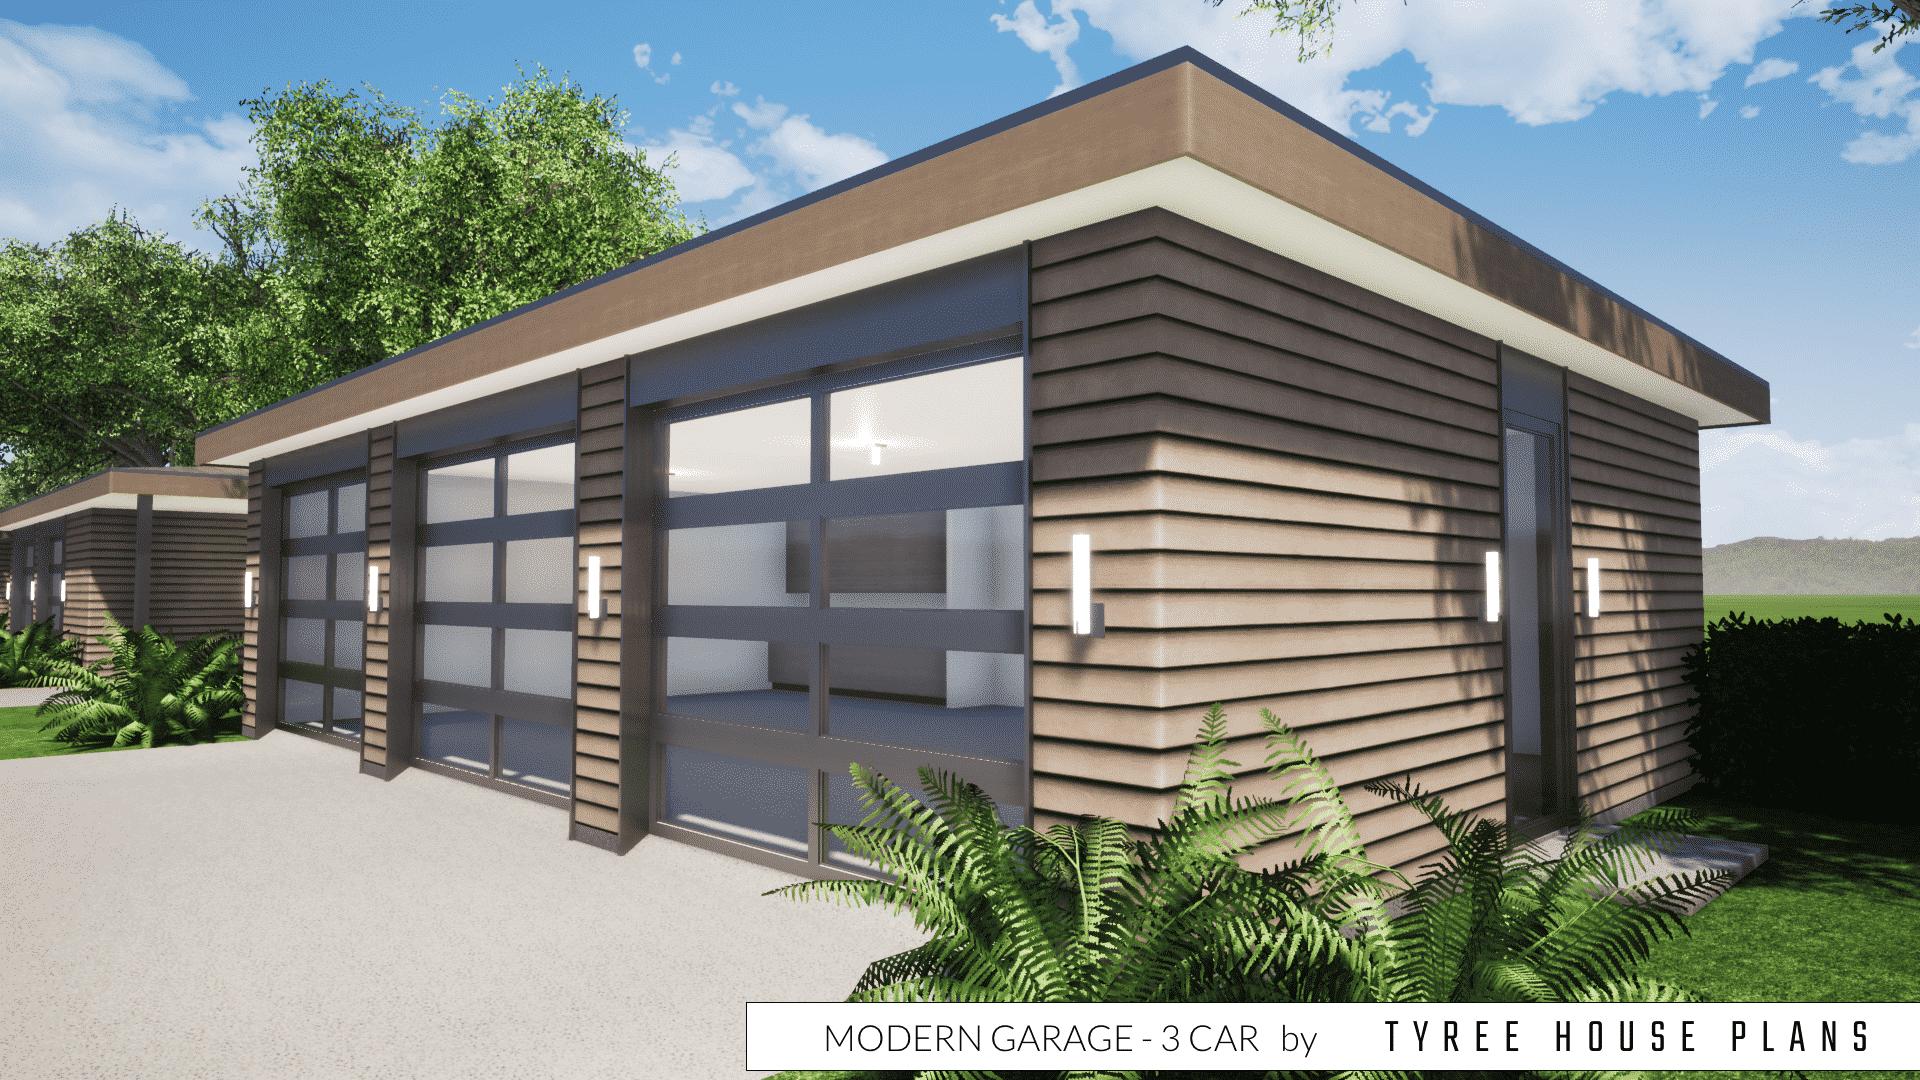 Modern Garage Plan - 3 Car by Tyree House Plans